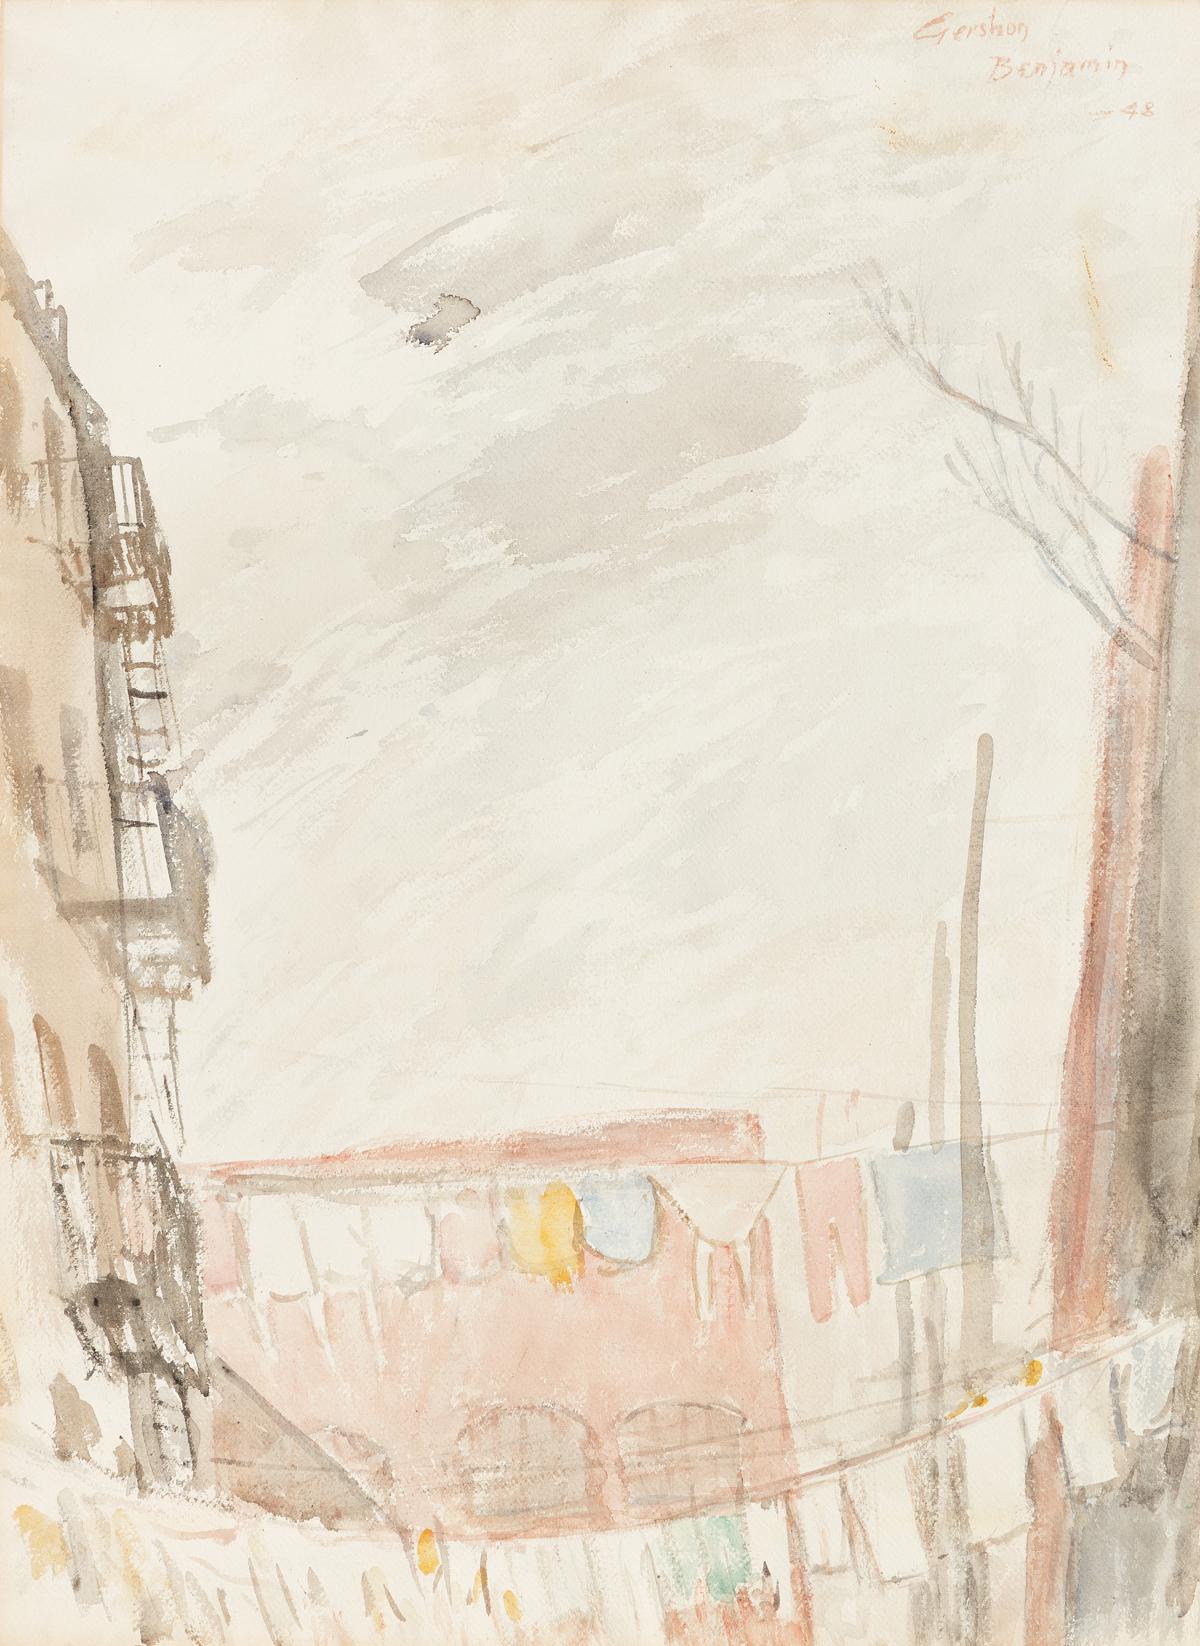 GERSHON BENJAMIN The Towers of New York * New York Backyards #5.